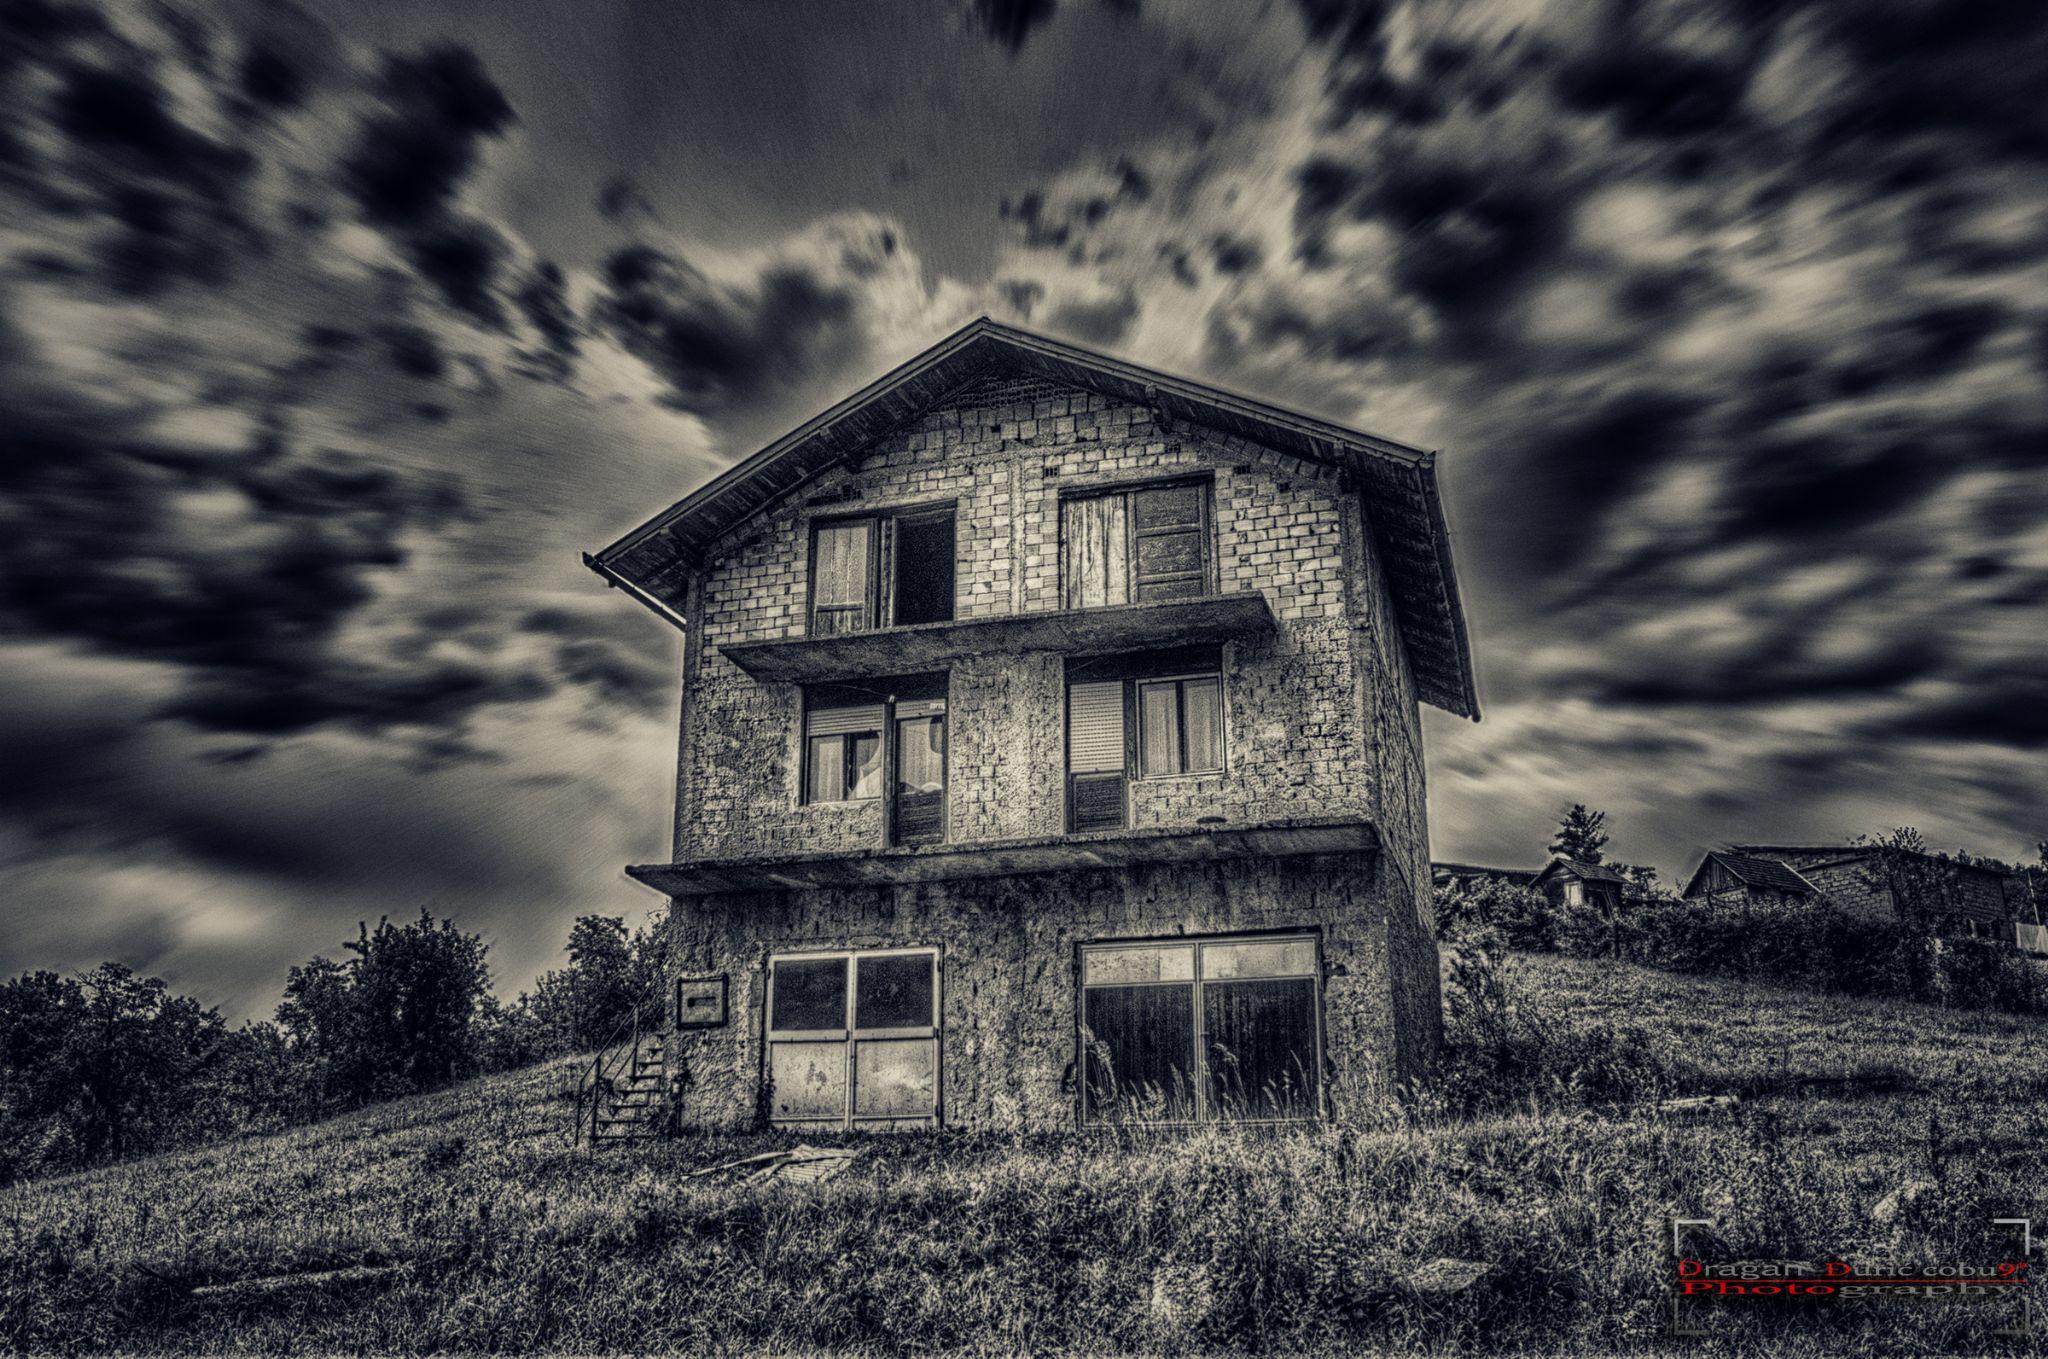 DSC08504_5_6_ by Dragan Đurić